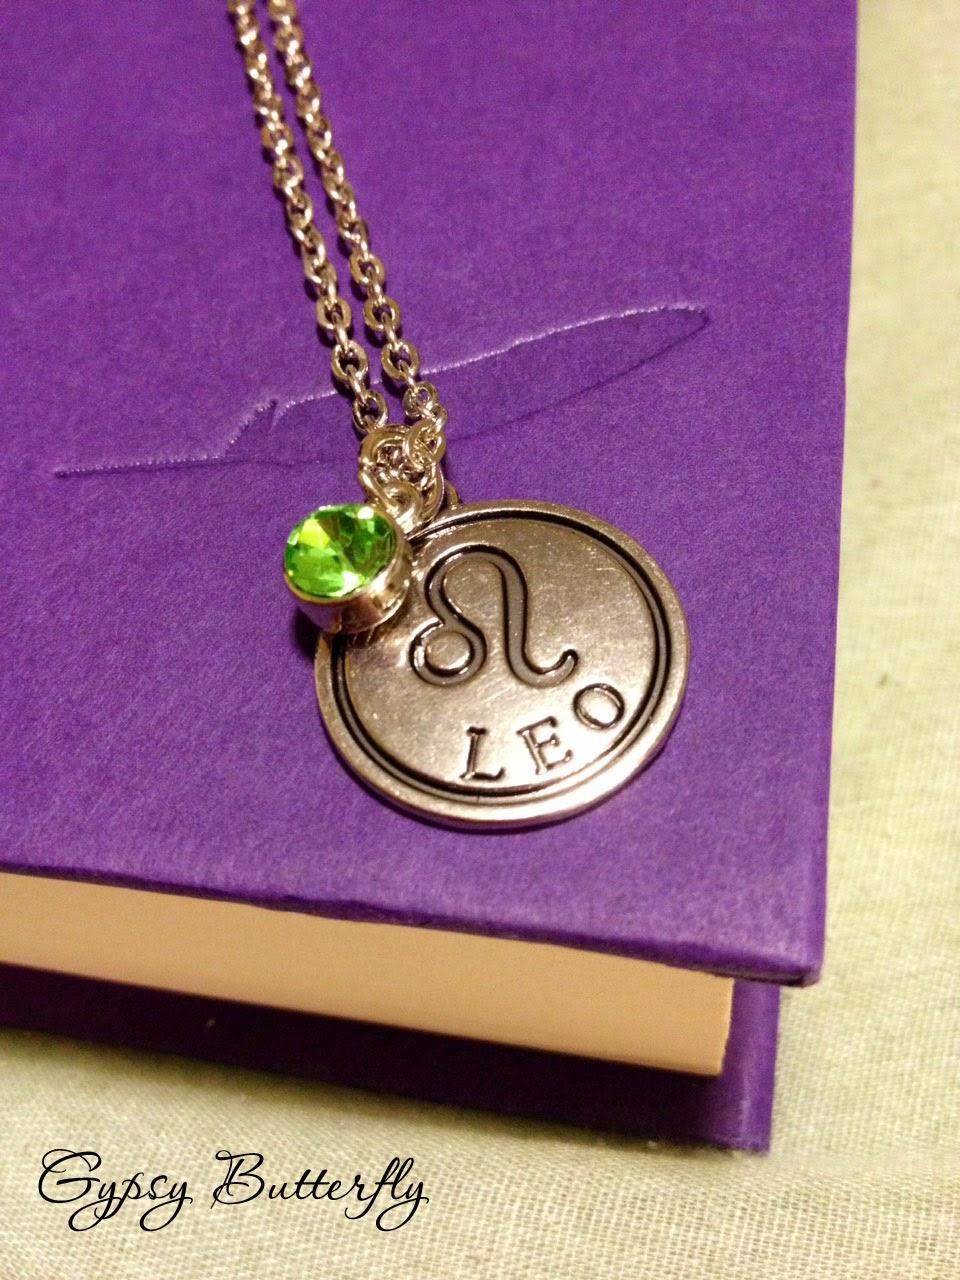 https://www.etsy.com/listing/196912241/leo-zodiac-sign-necklace-peridot-birth?